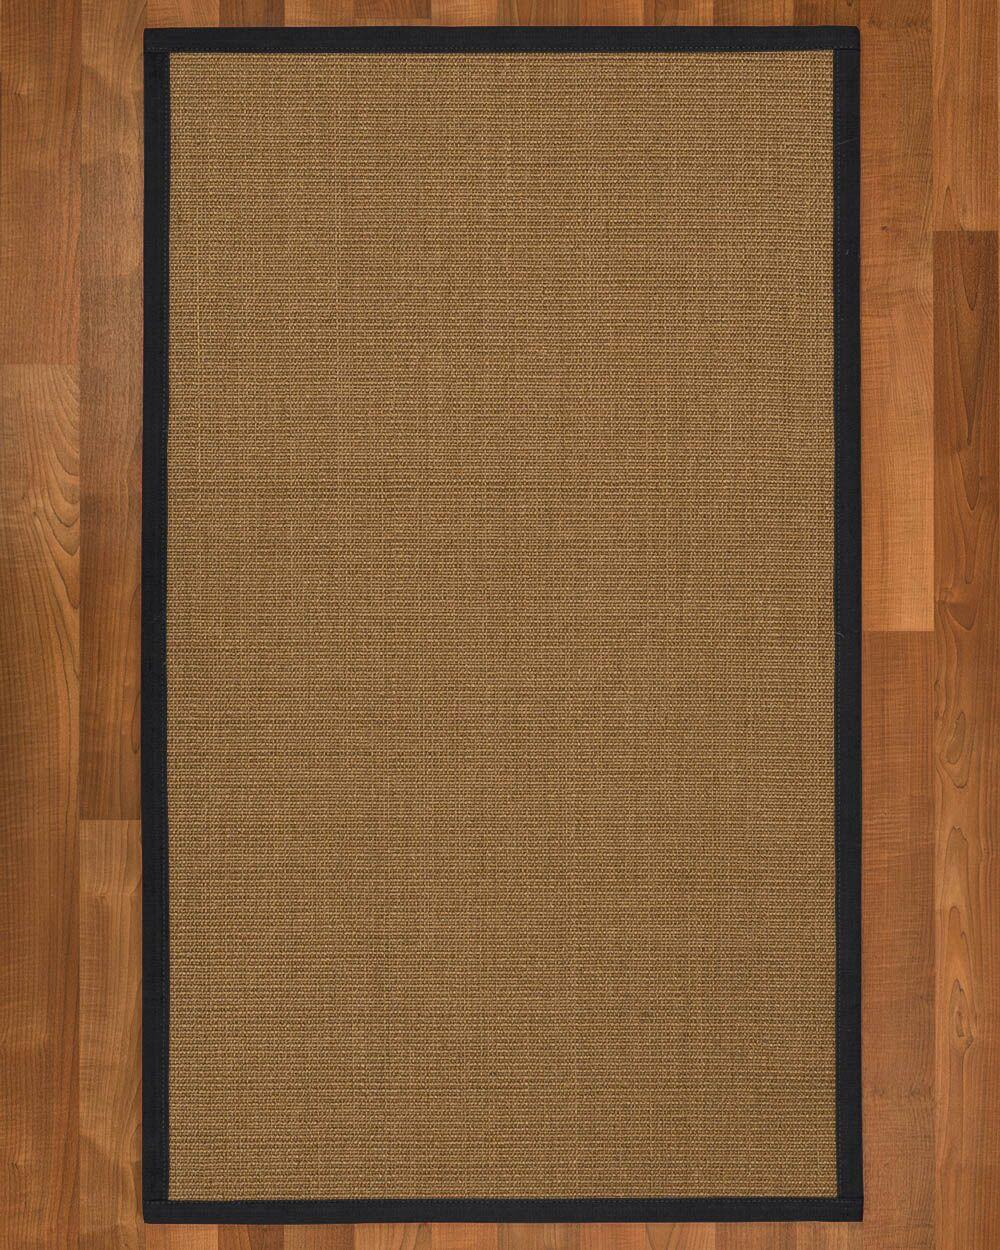 Jamesville Hand Woven Brown Area Rug Rug Size: Runner 2'6